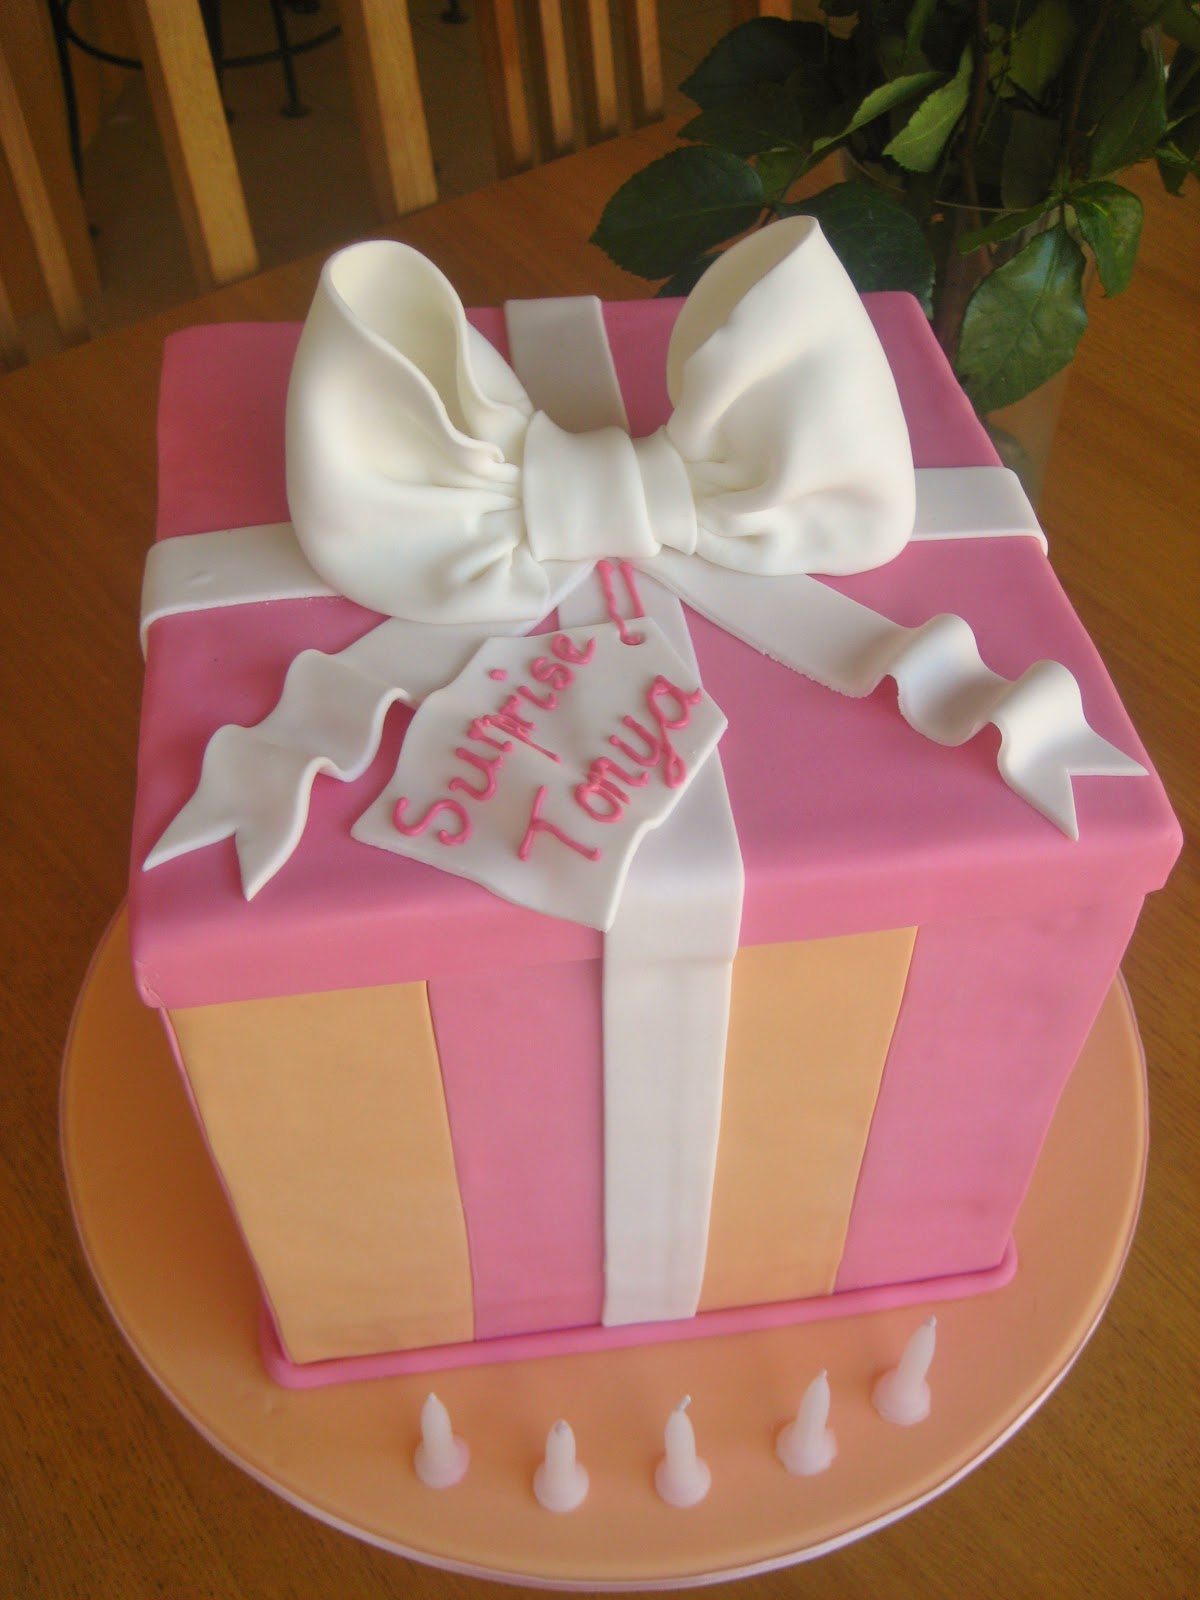 IMG_5866 birthday cakes to usa 7 on birthday cakes to usa